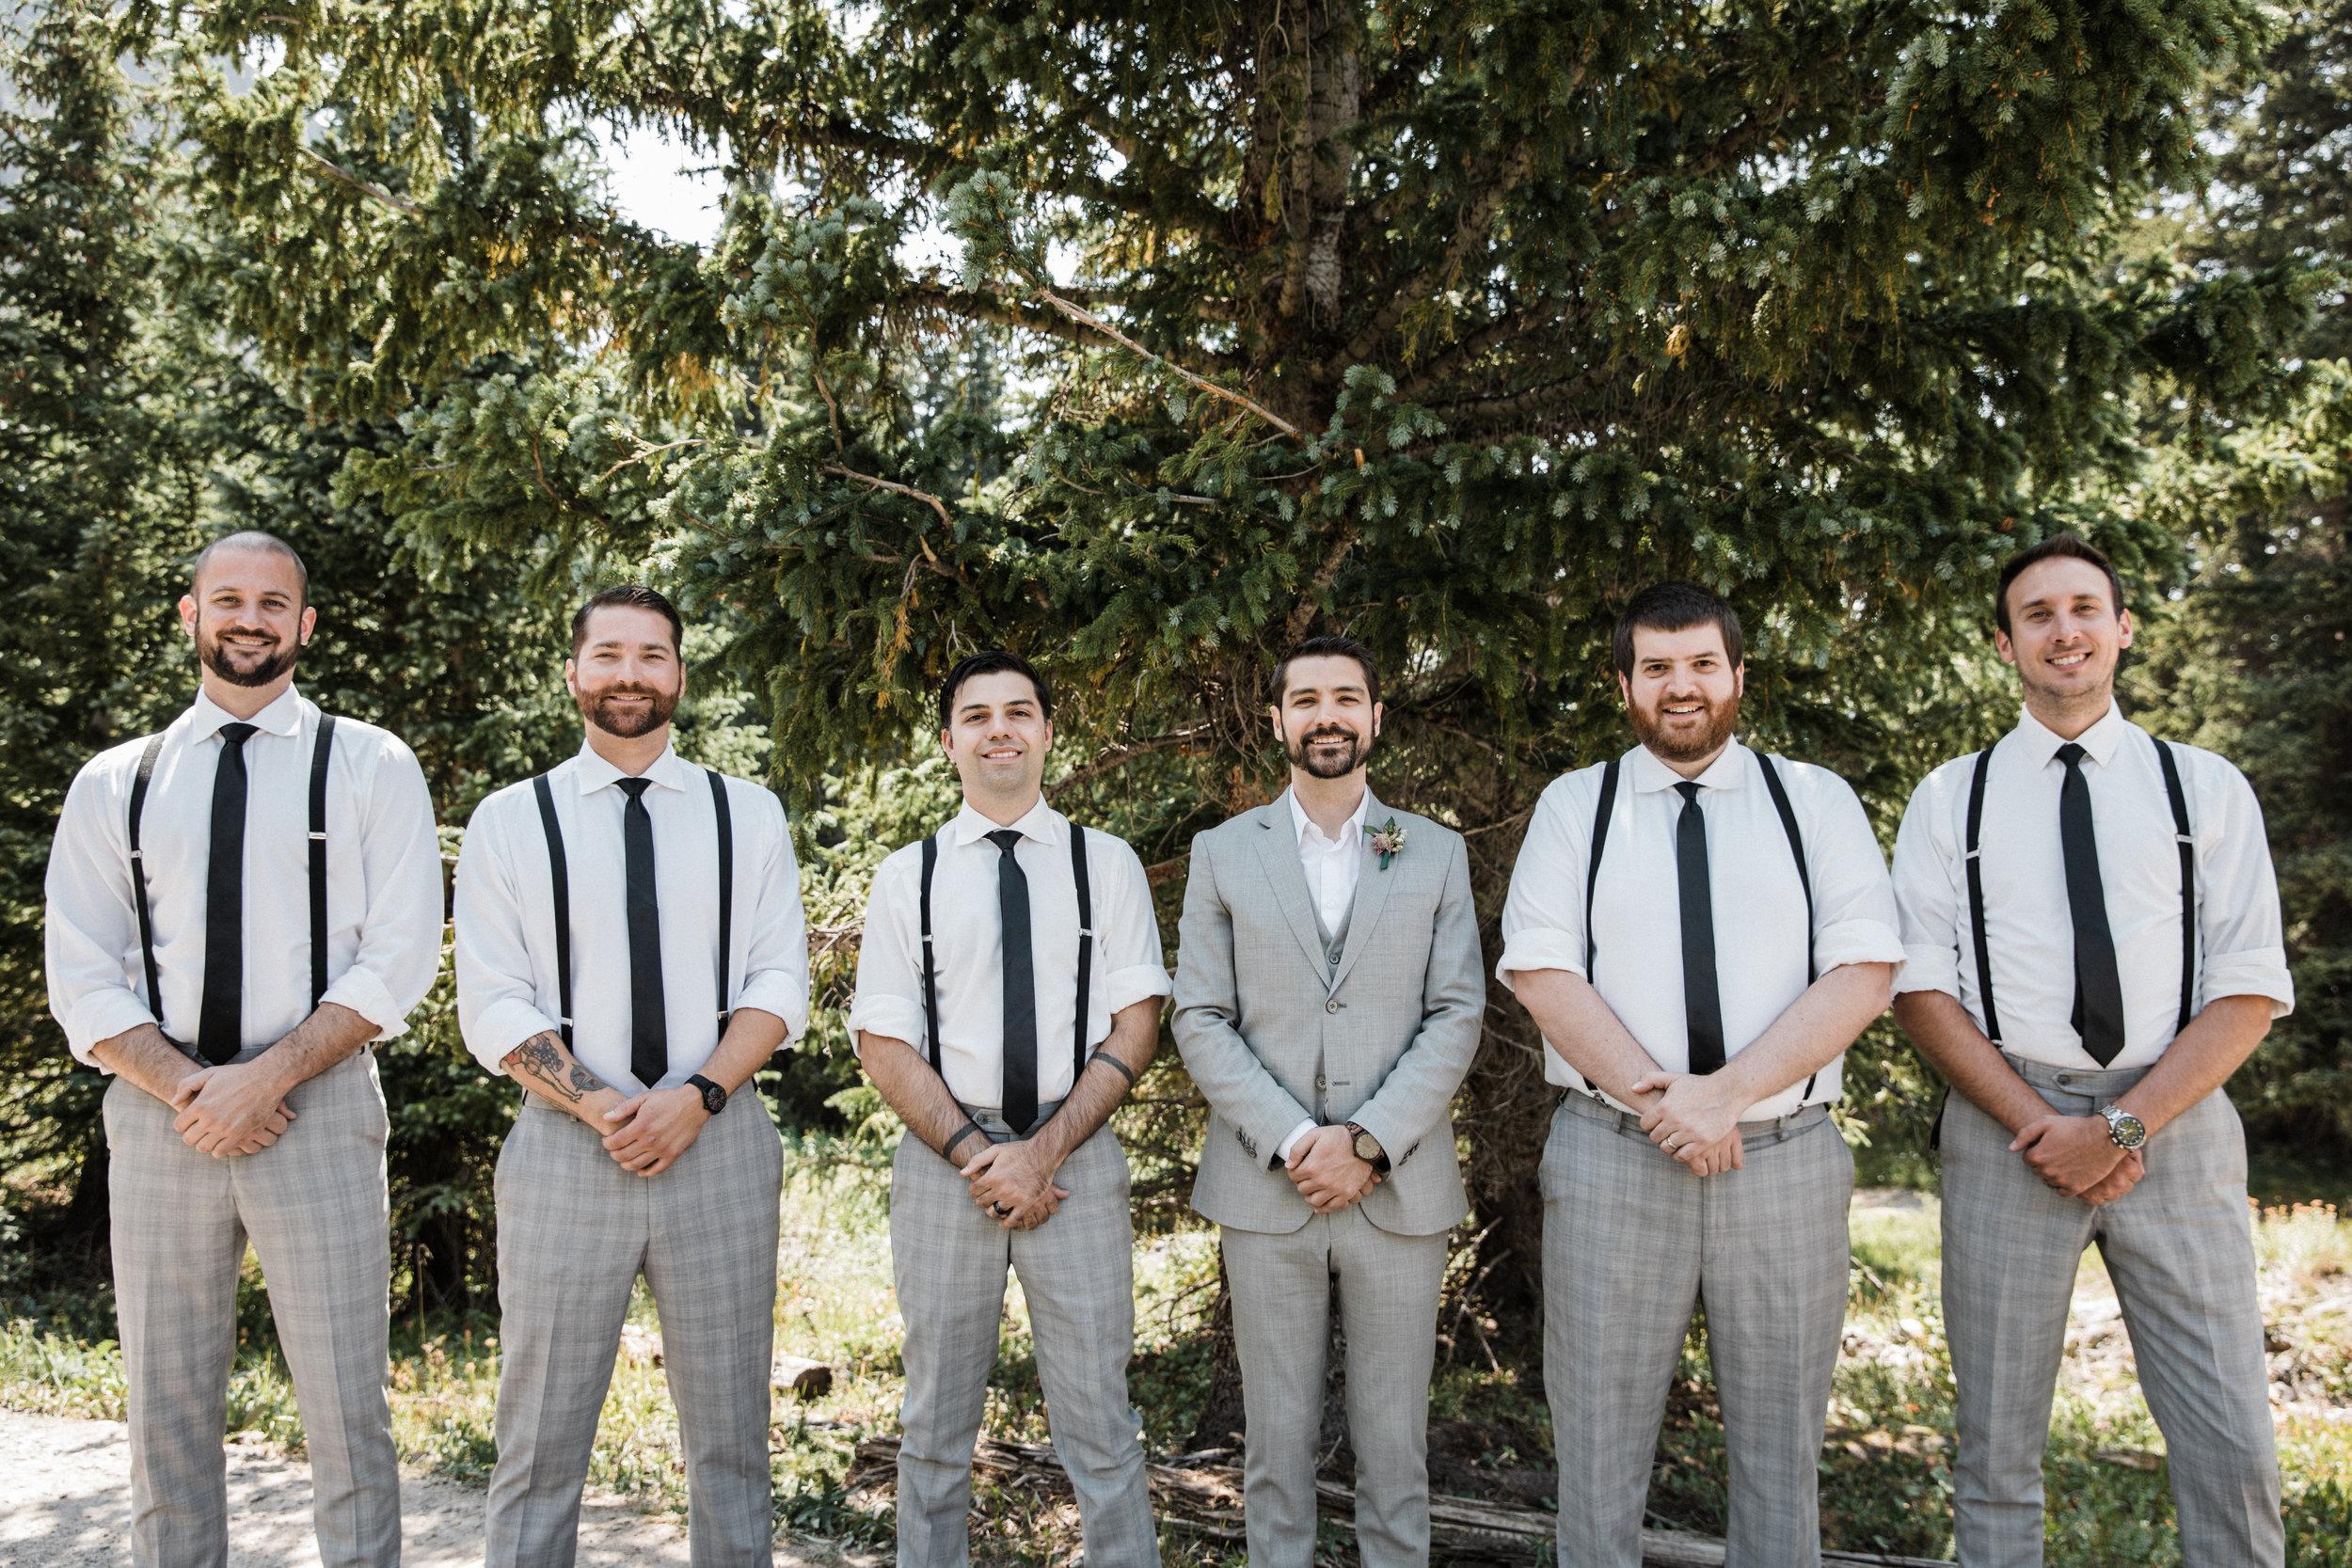 SB-leahandashton-telluride-wedding-photography-0016.jpg